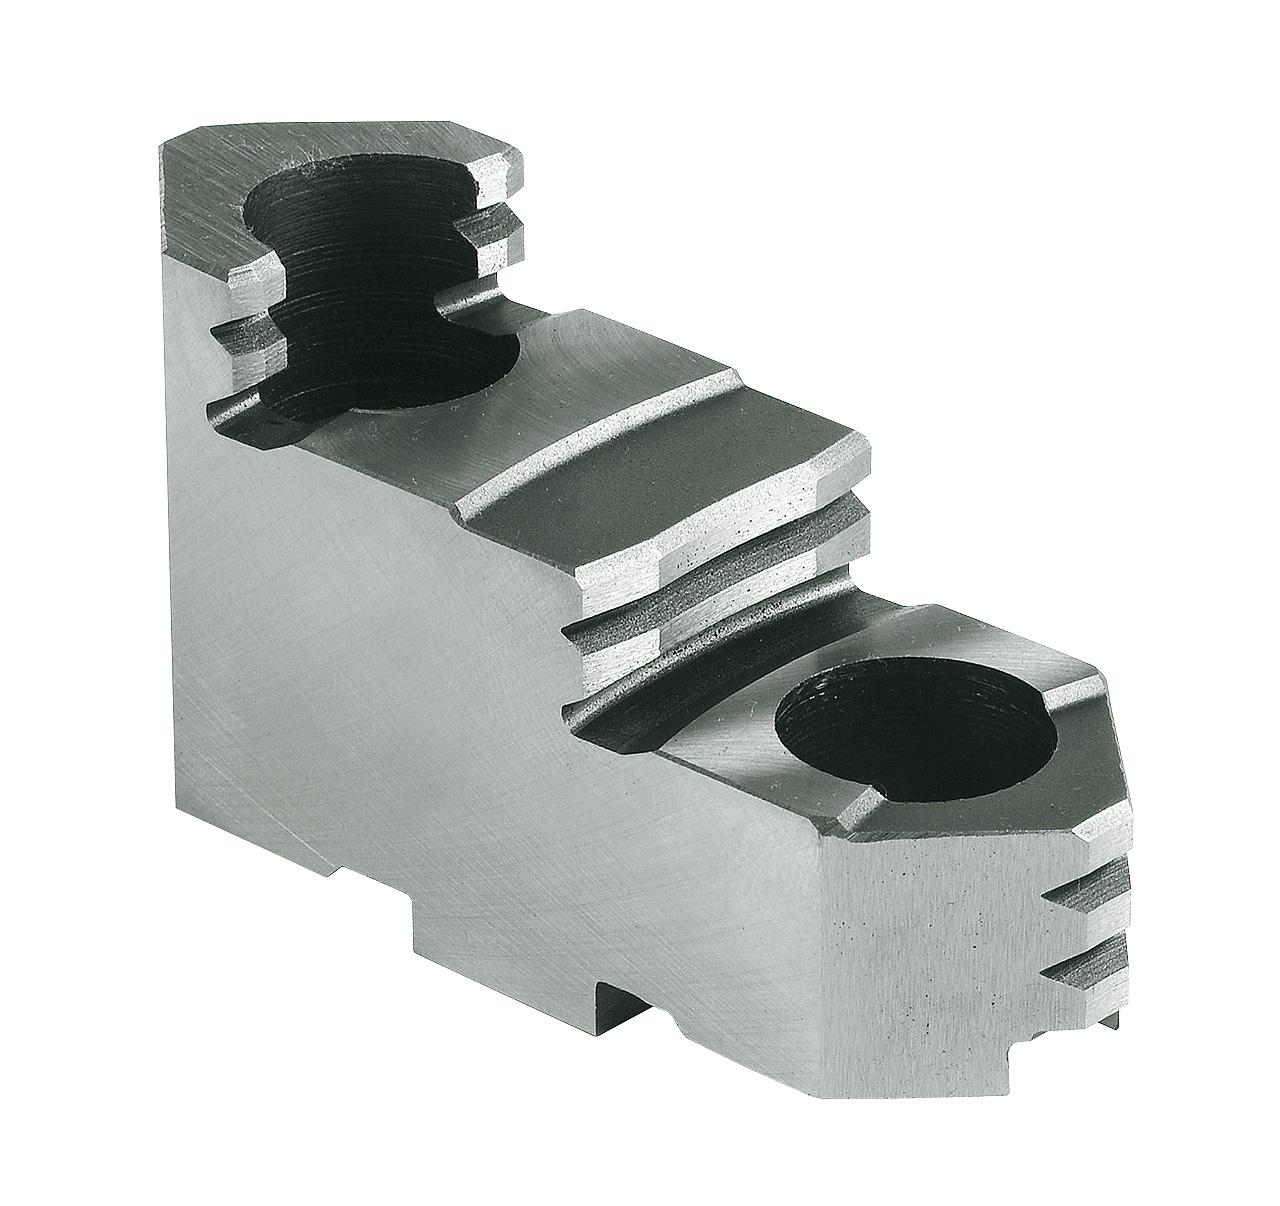 Szczęki górne twarde - komplet TJ-PS4-315 BERNARDO